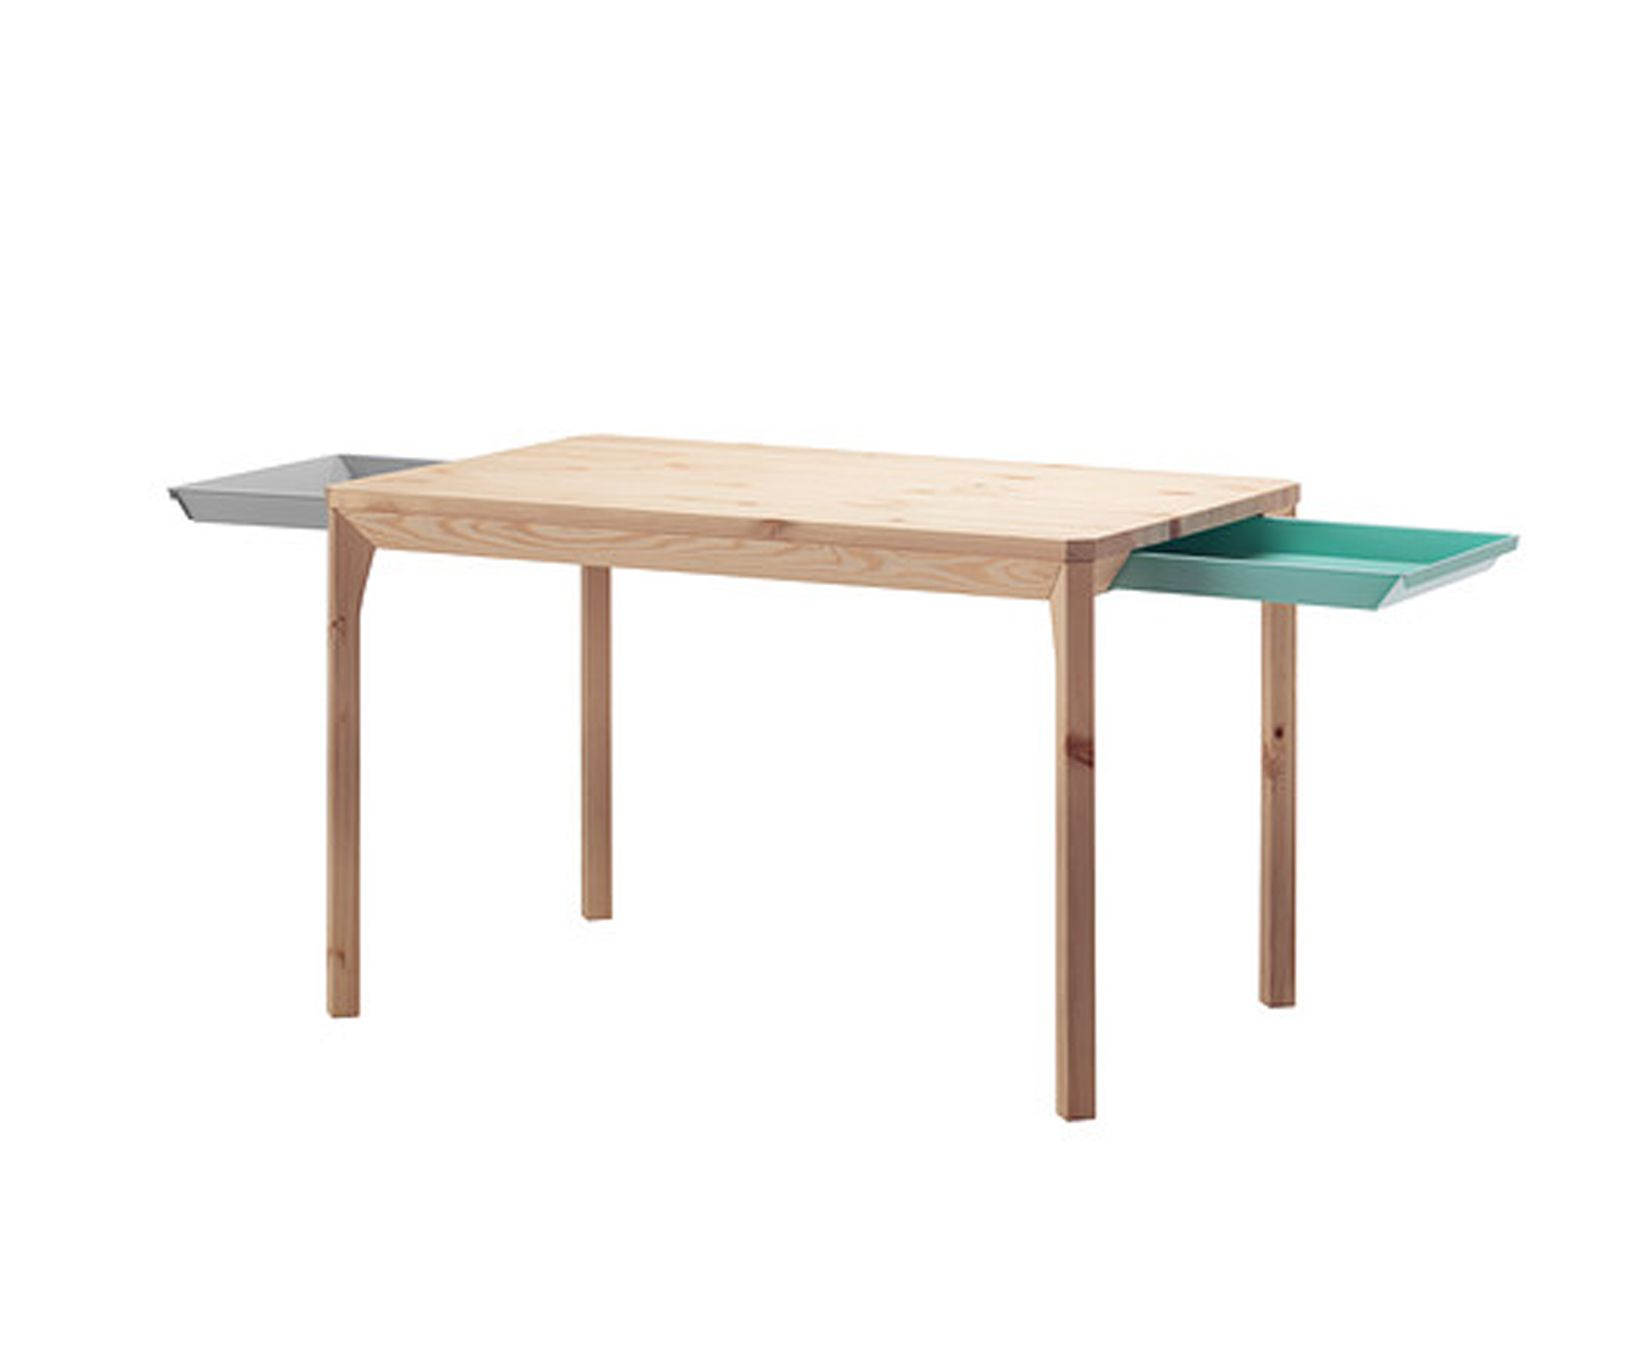 Table En Bois Tiroirs Colores Via Goodmoods Salle A Manger Ikea